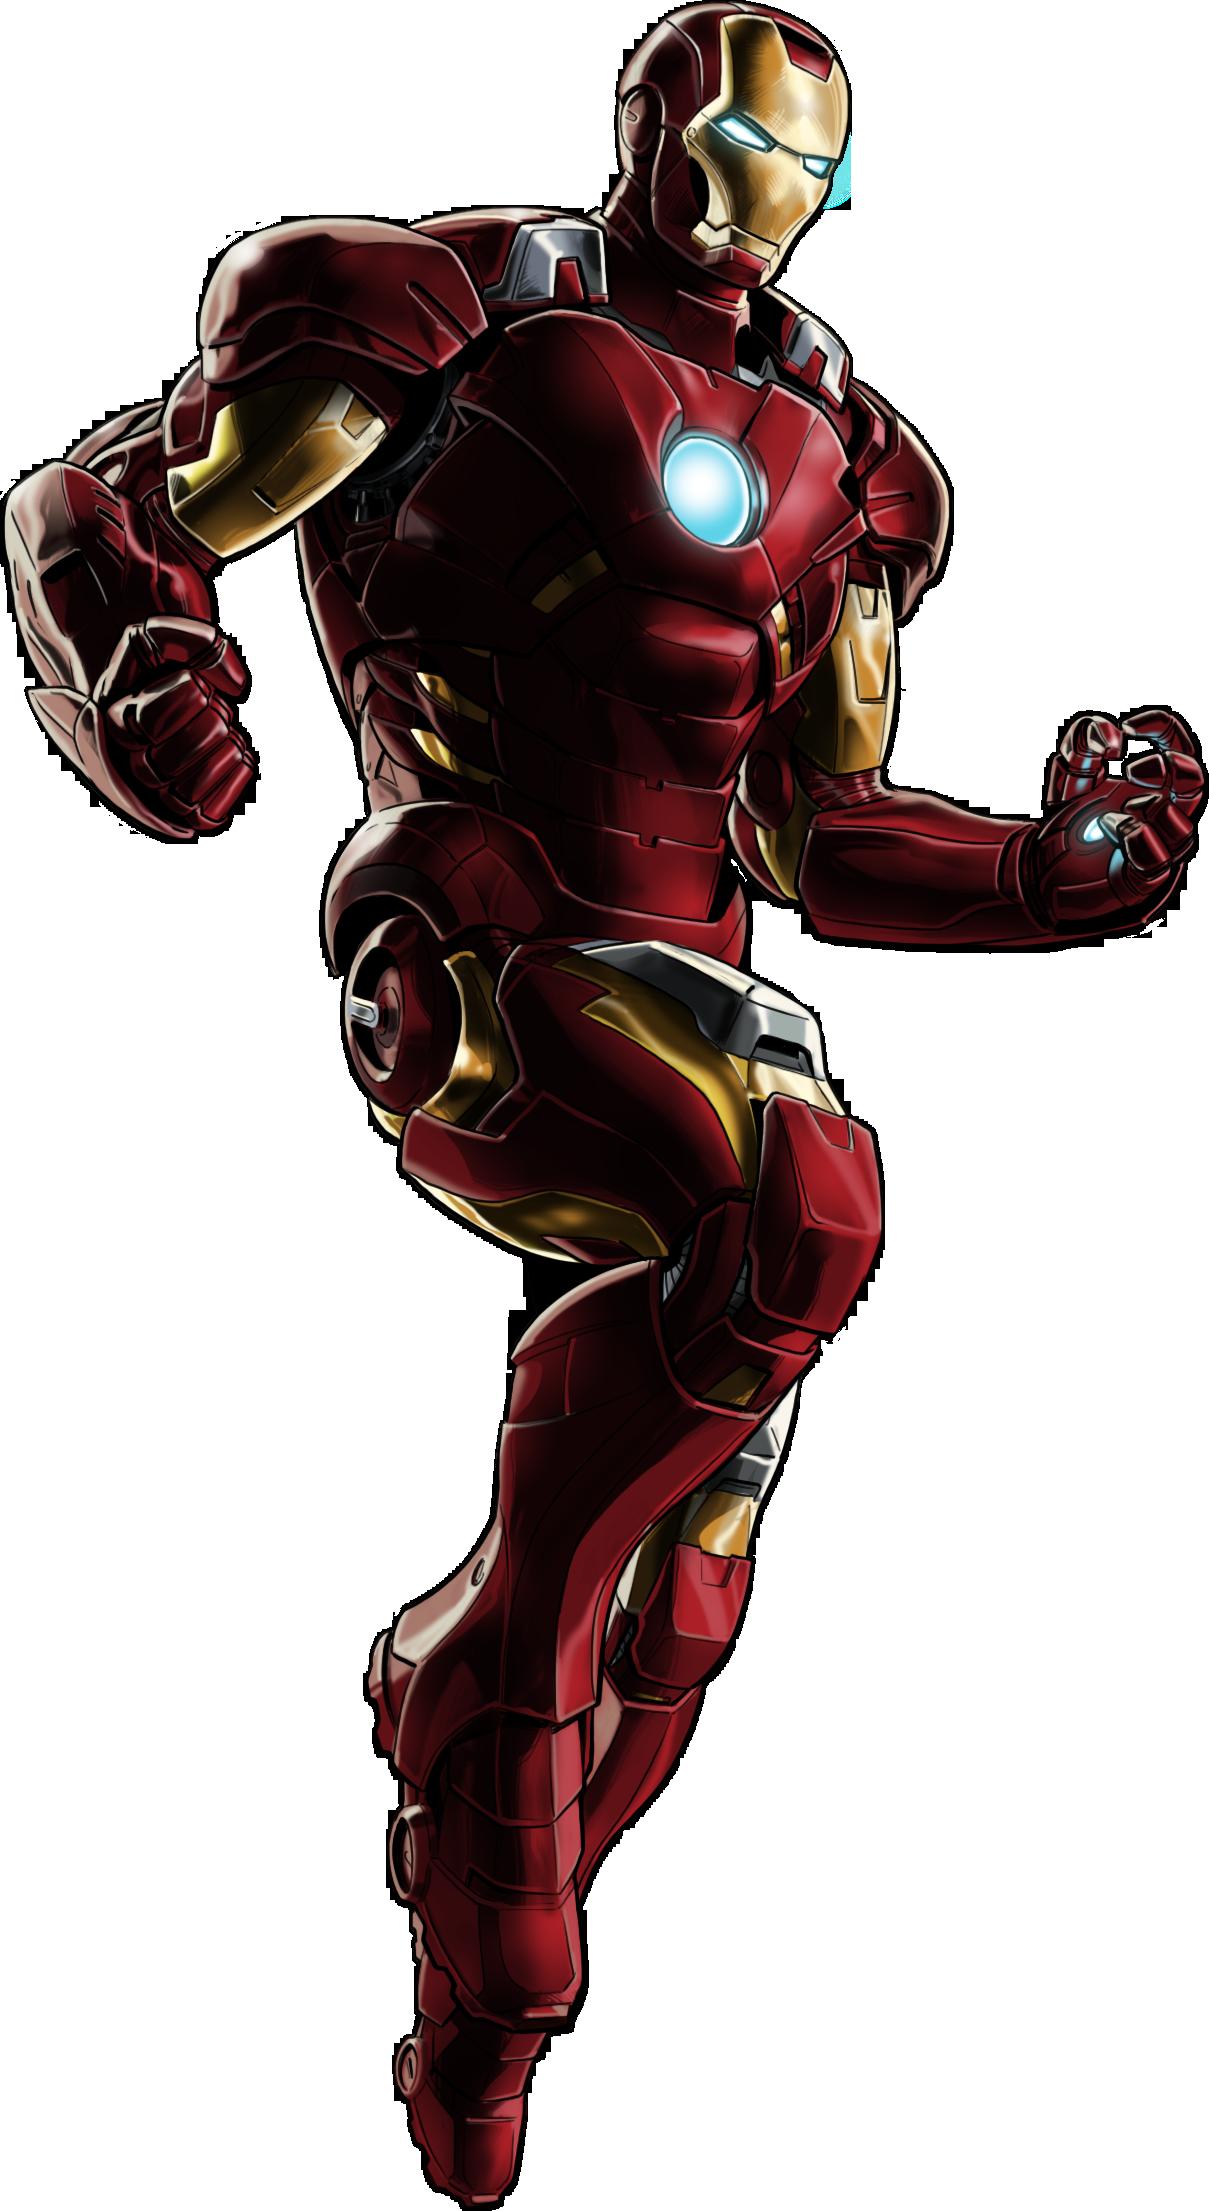 Iron Man (Marvel Comics) | VS Battles Wiki | FANDOM powered